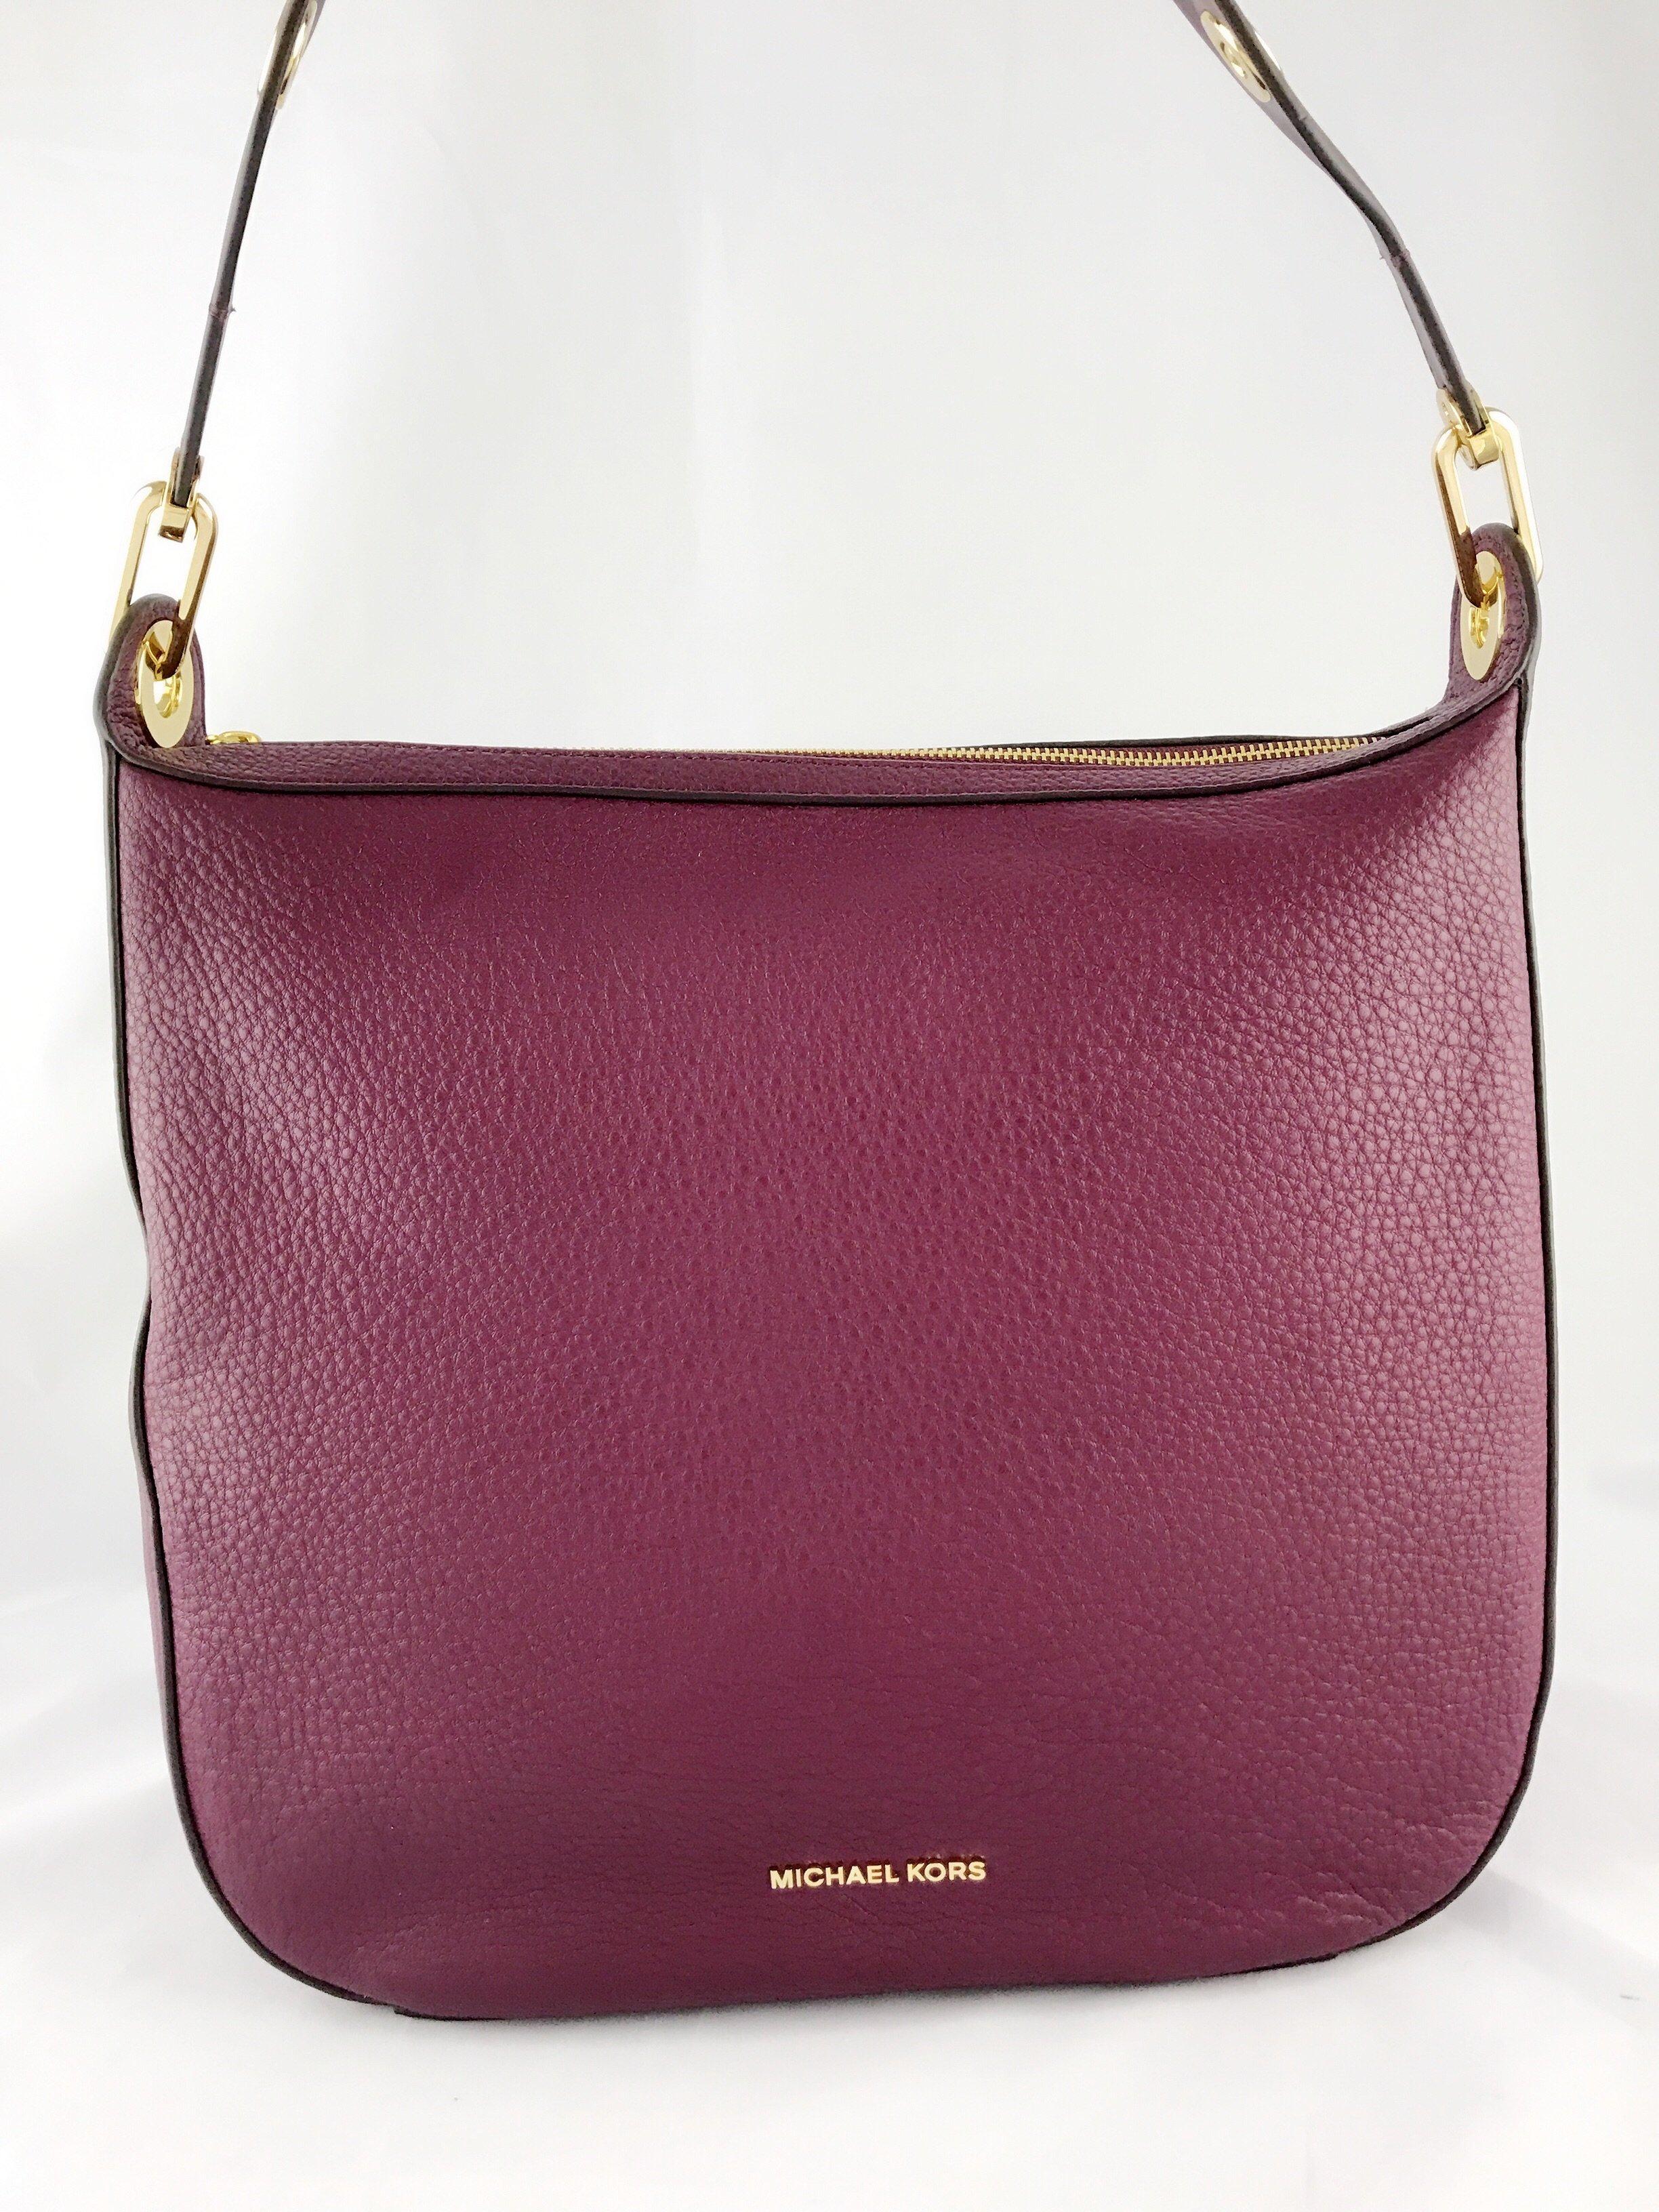 8f41f8355cc1 michael michael kors raven large leather shoulder bag, purple - Walmart.com